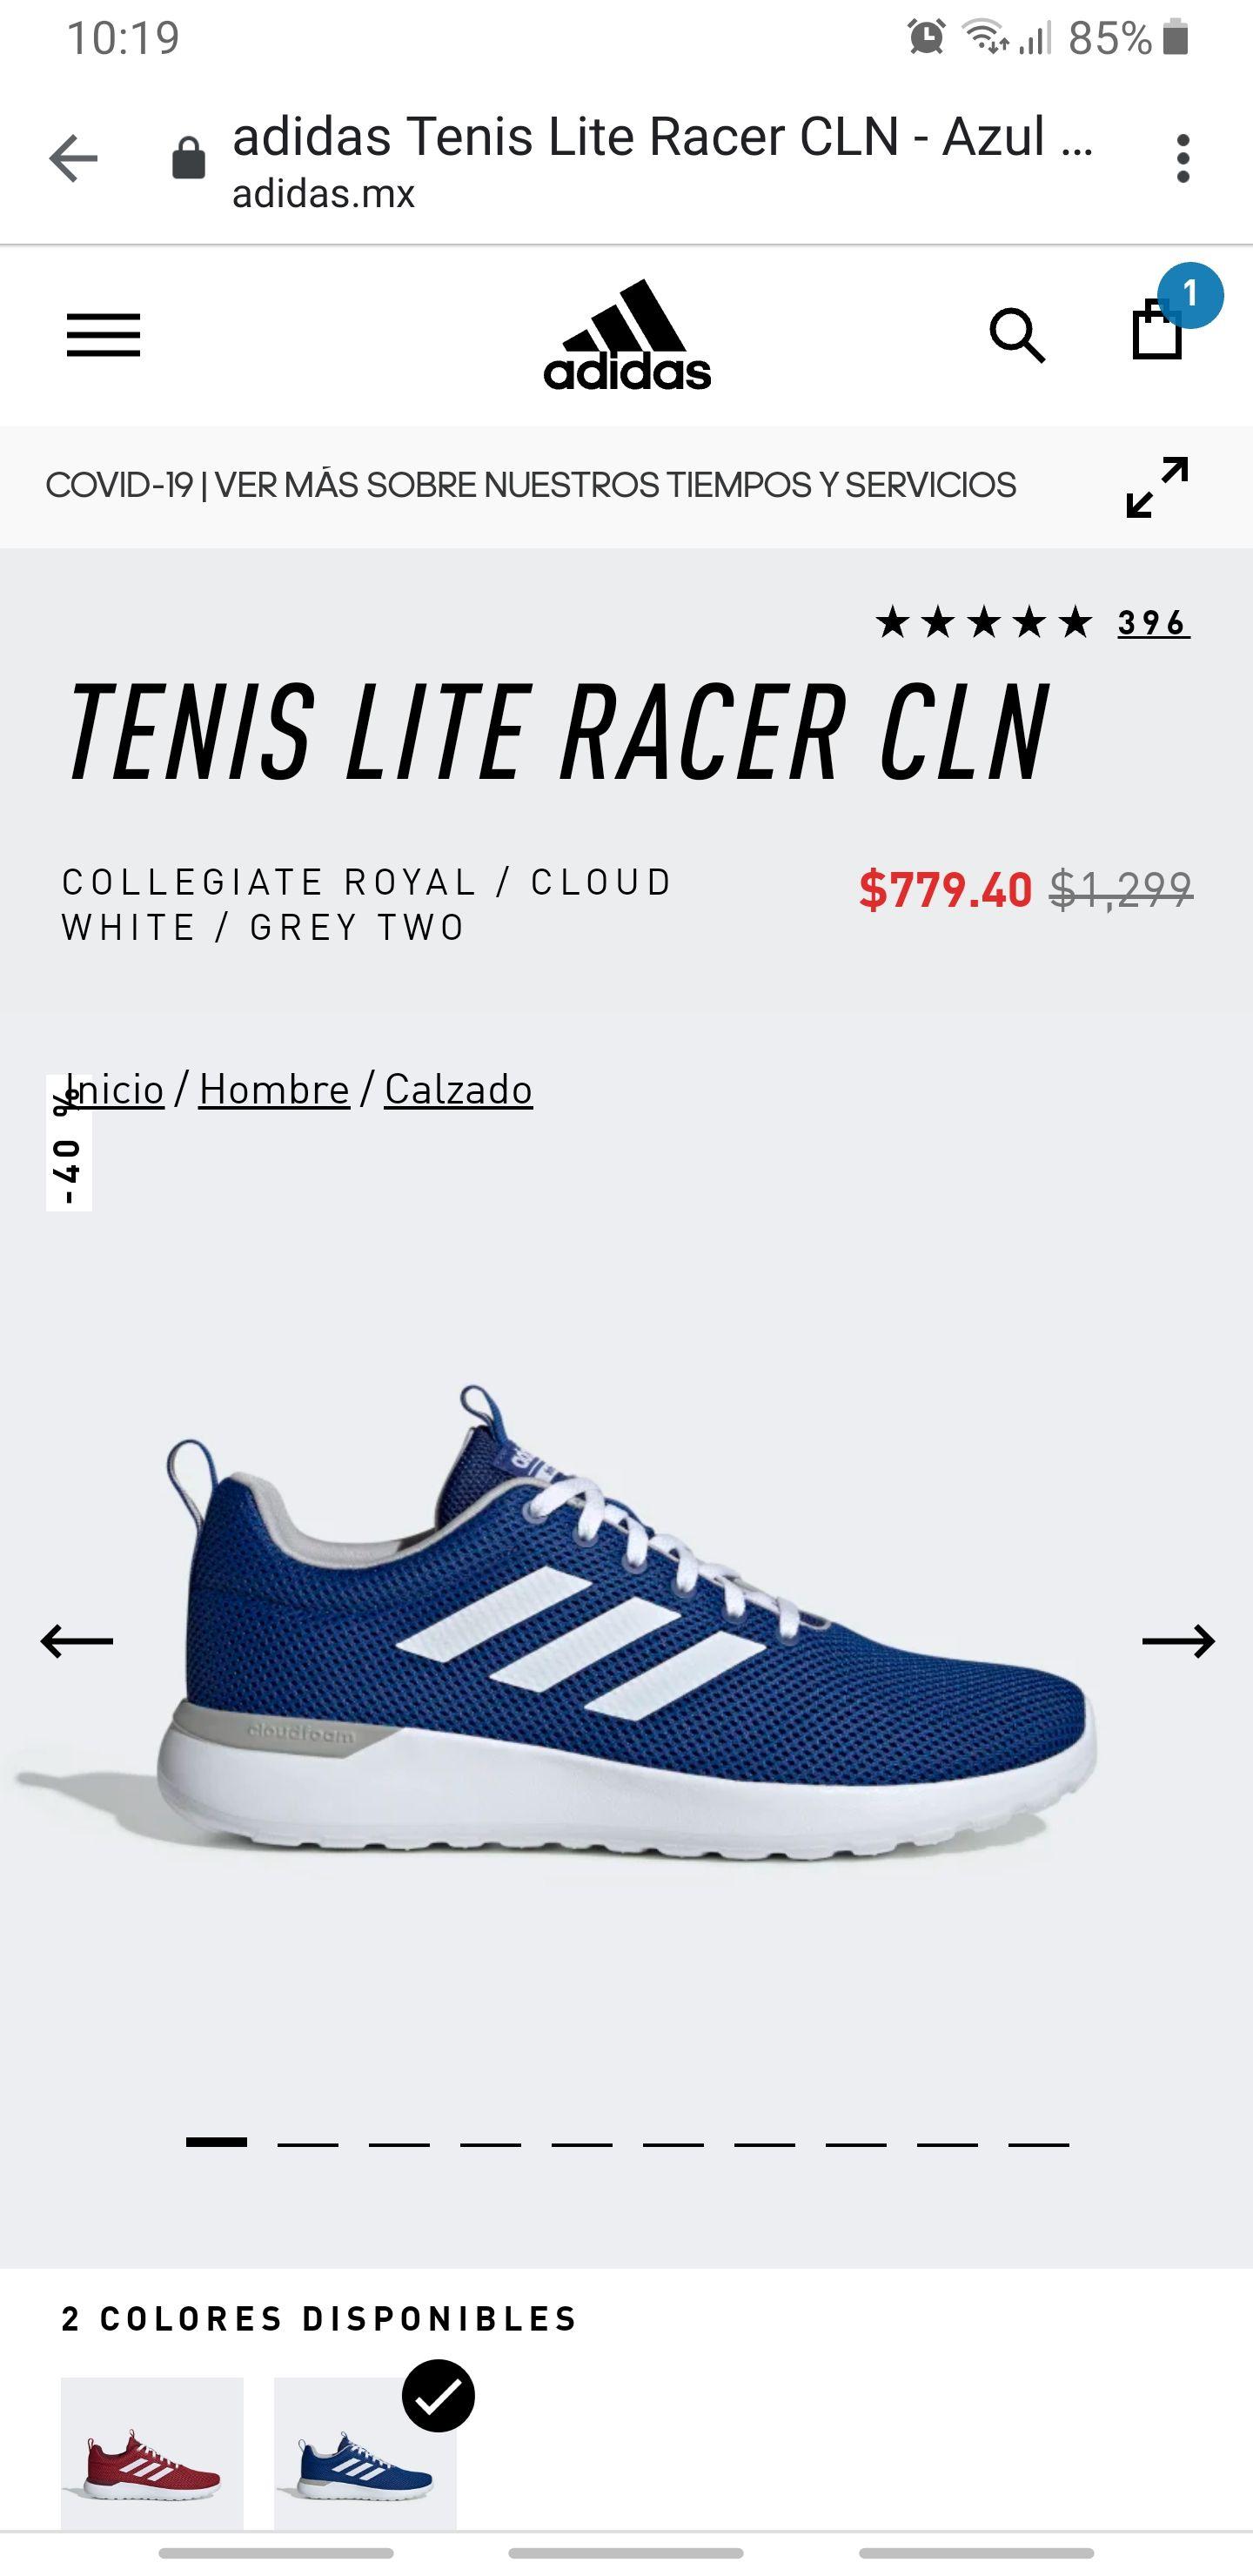 Adidas: Tenis Adidas lite racer cln